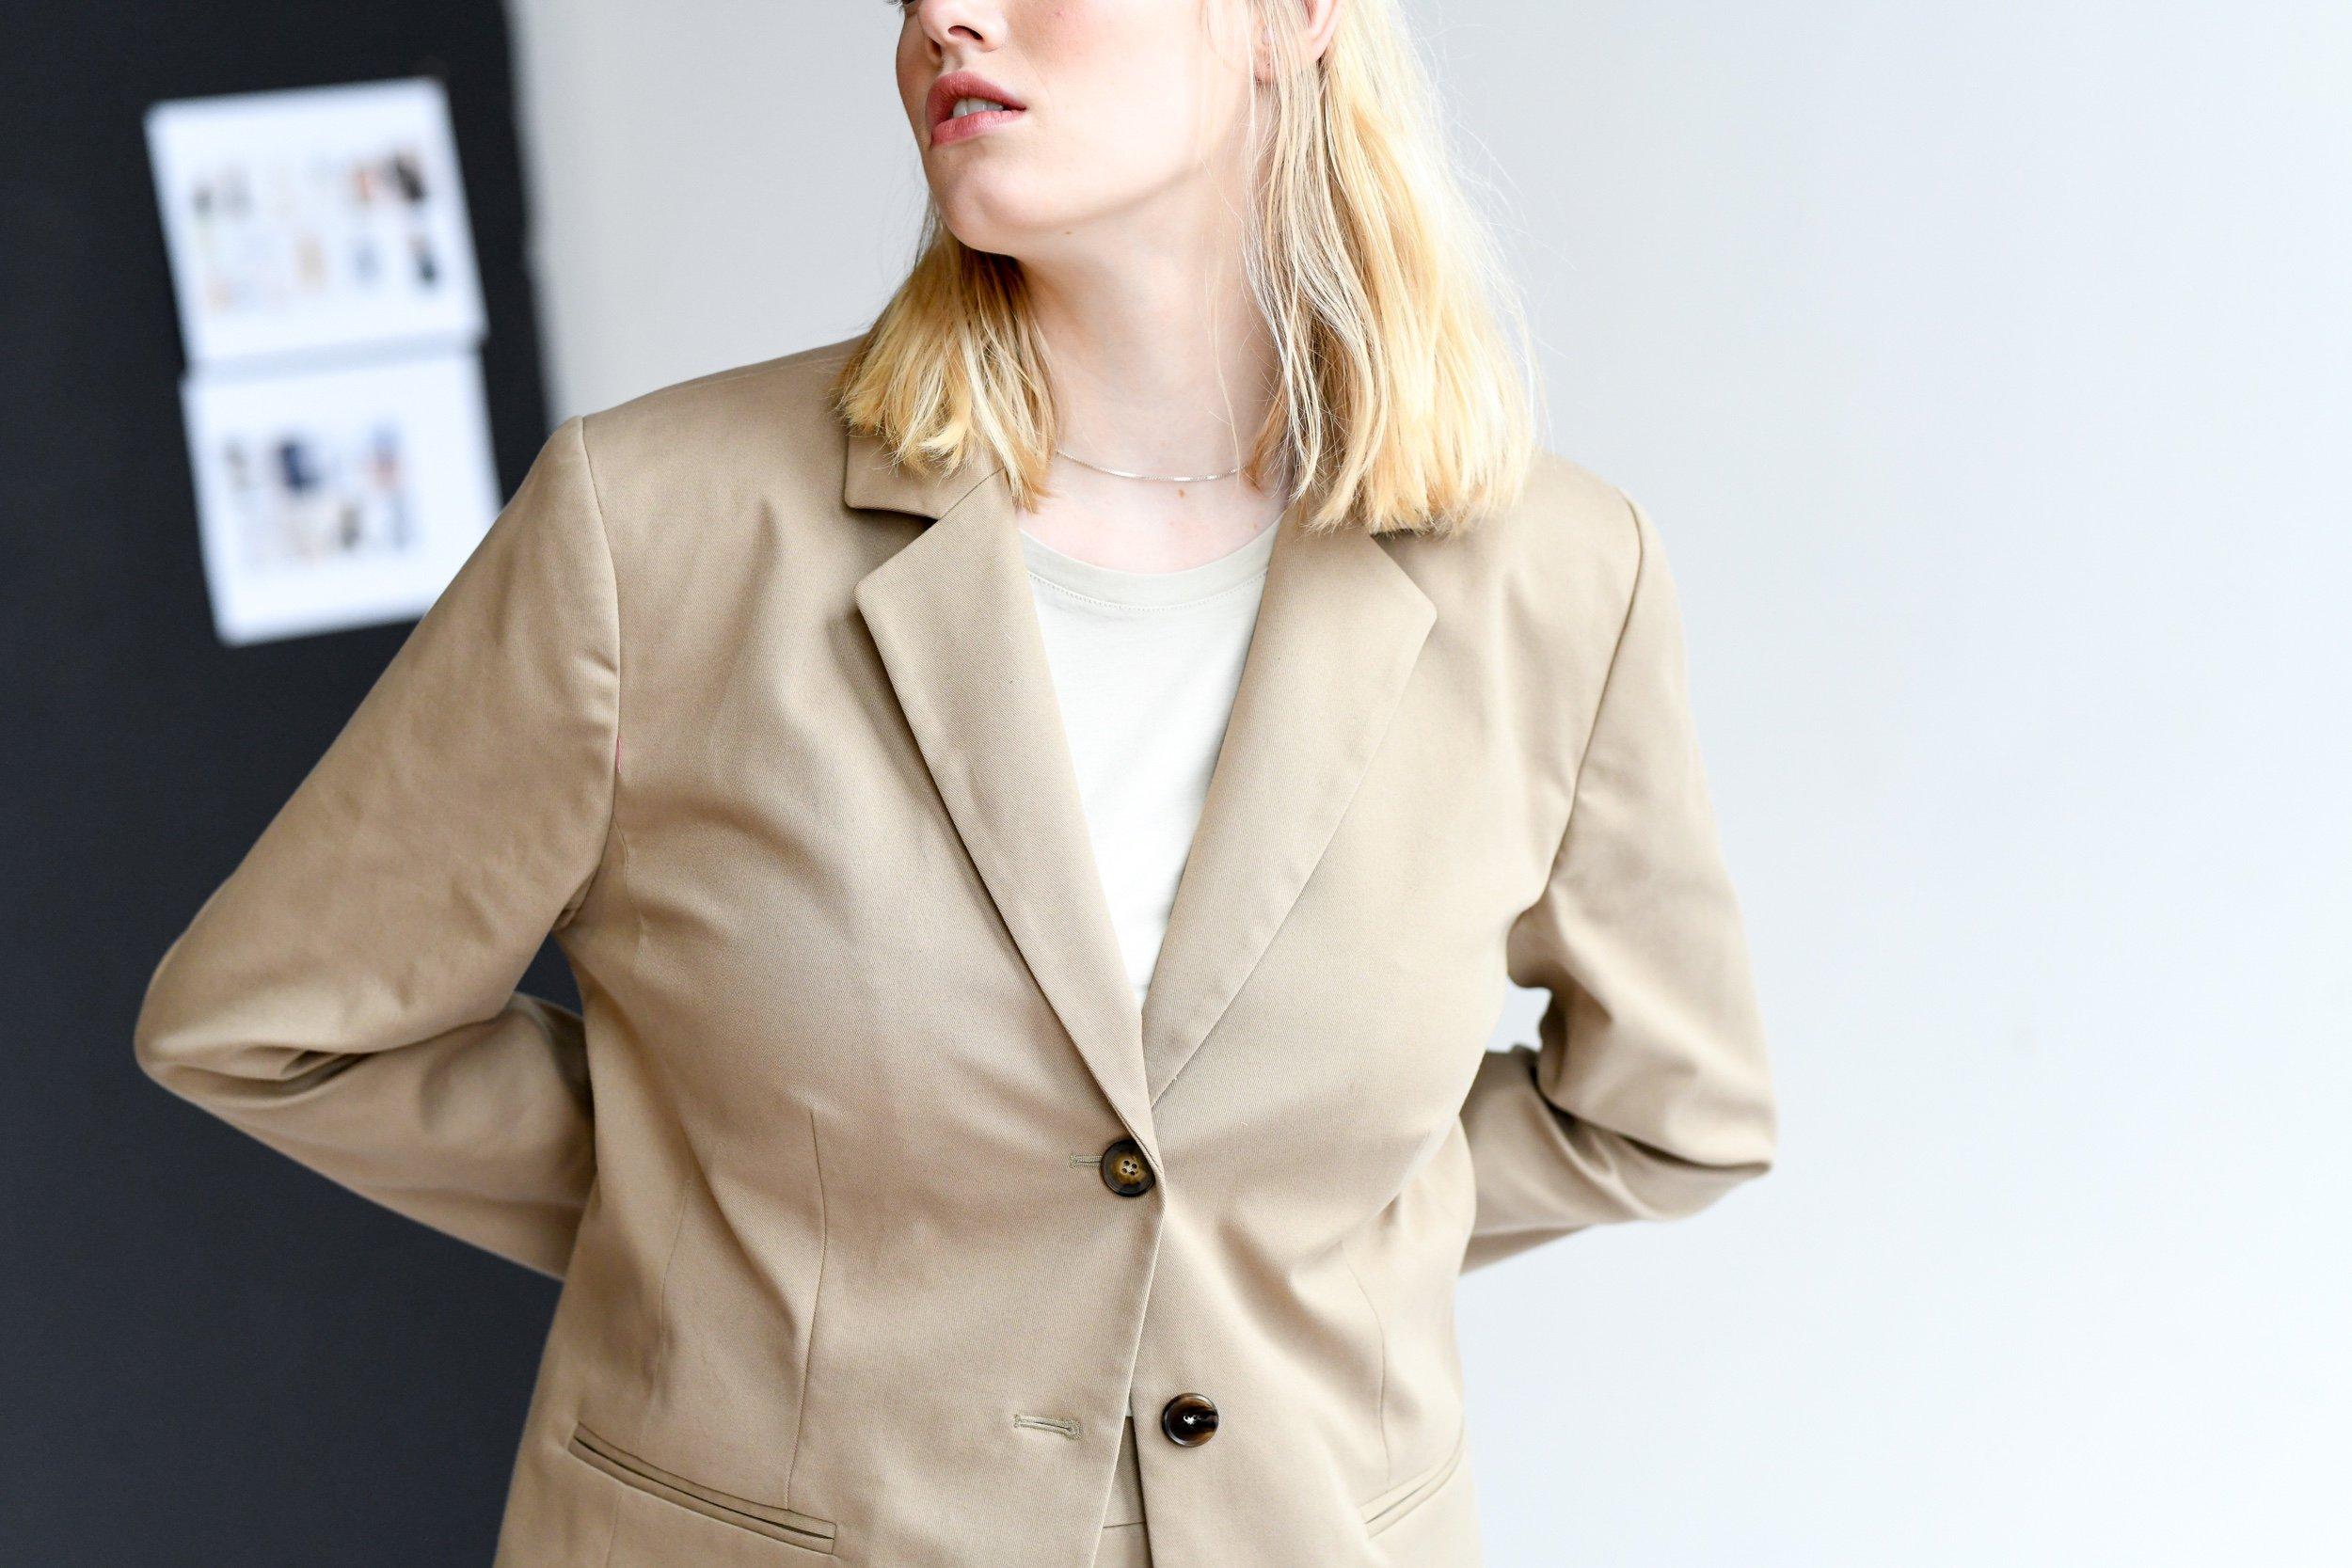 Blonde model wearing a beige trenchcoat